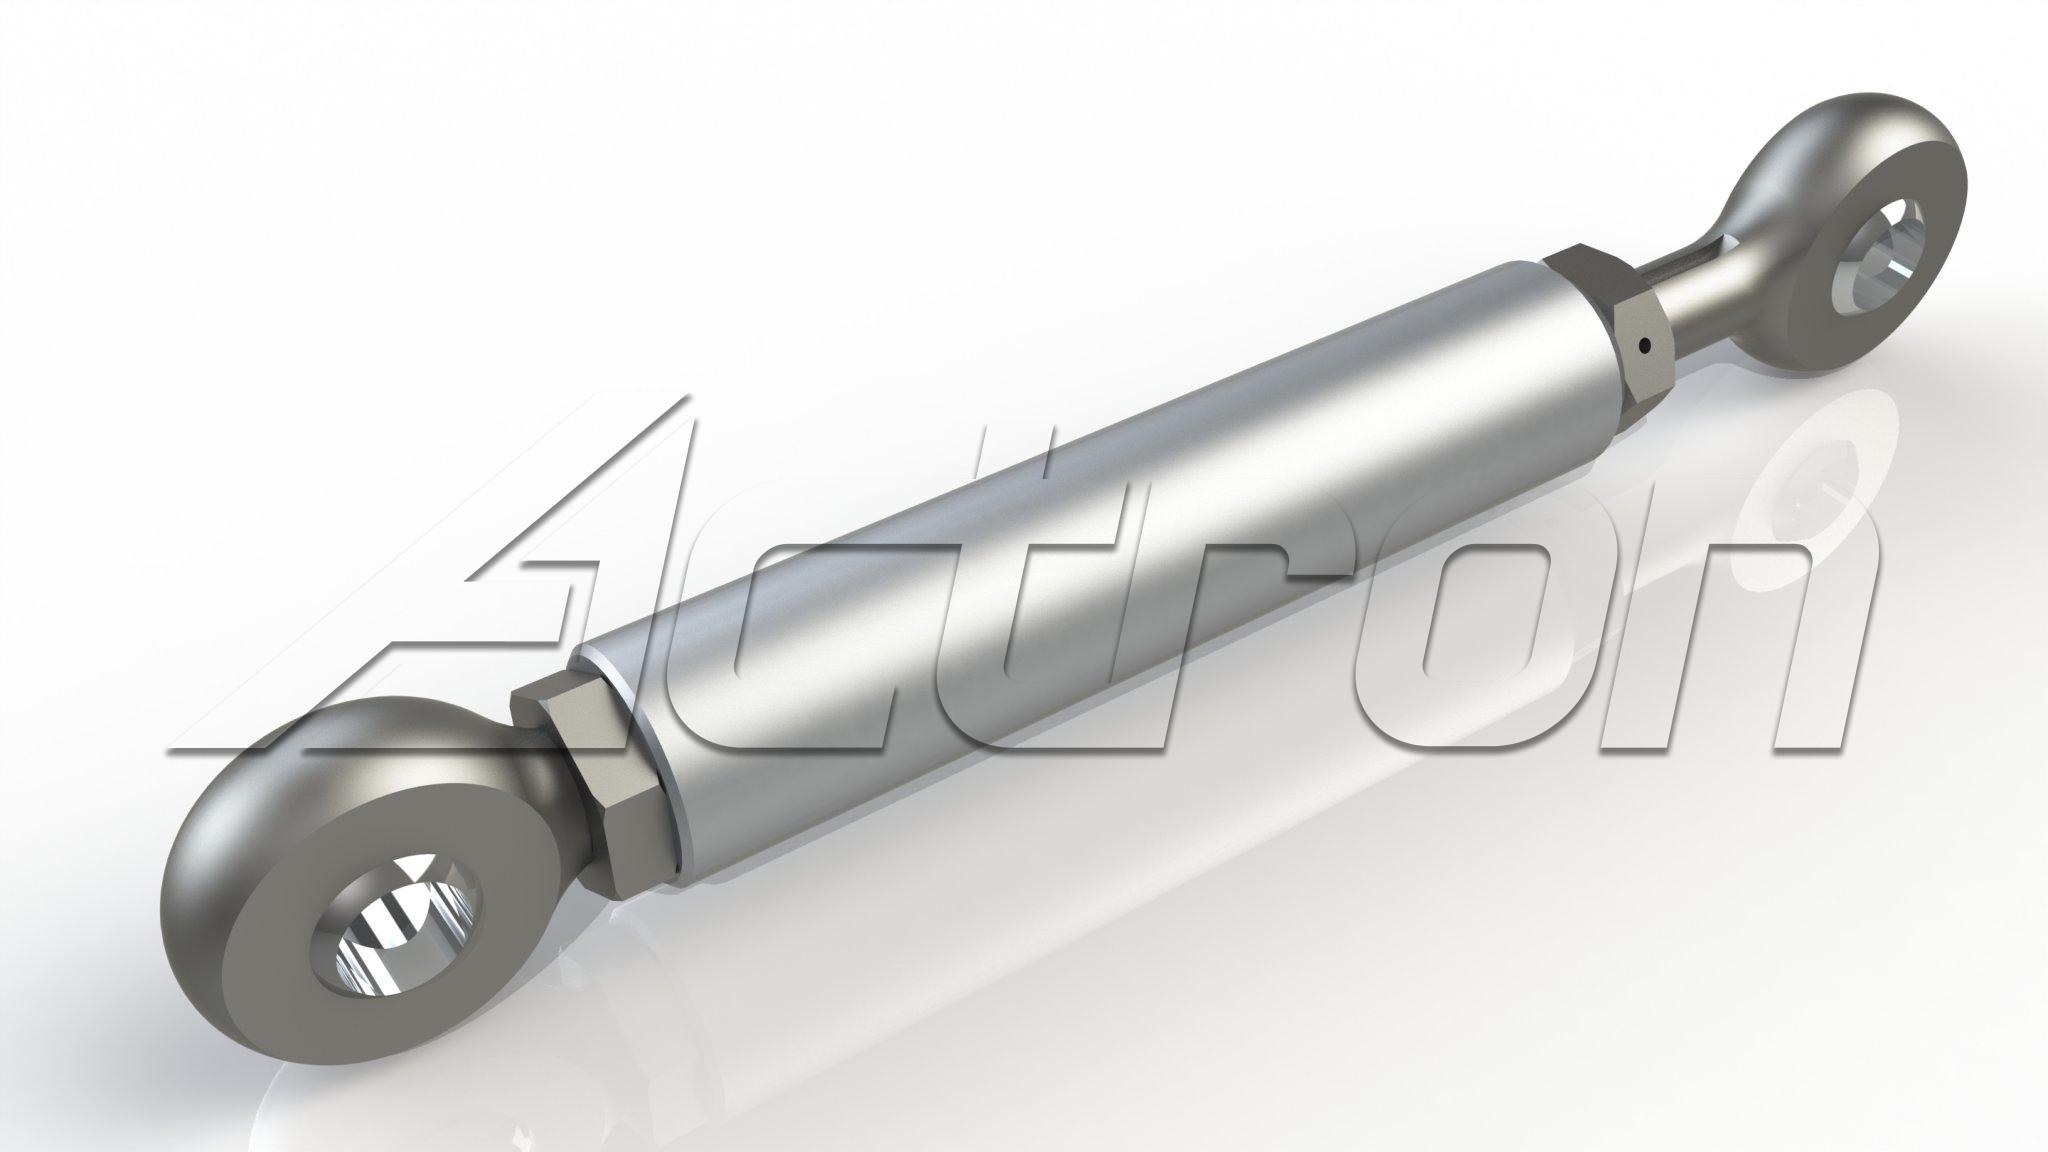 strut-assy-5205-a48038.jpg